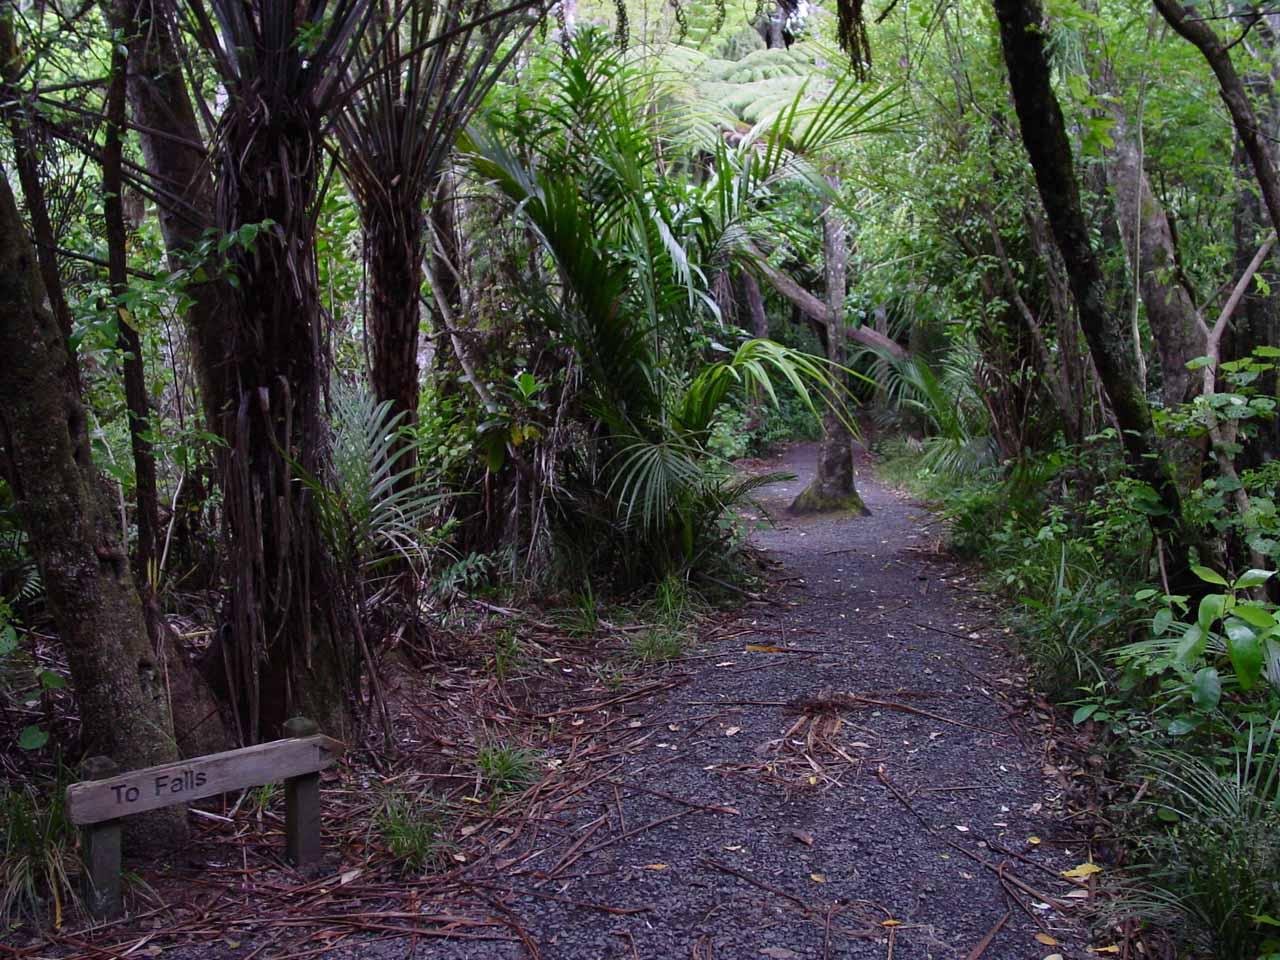 Walking through the bush track on the way to Kitekite Falls